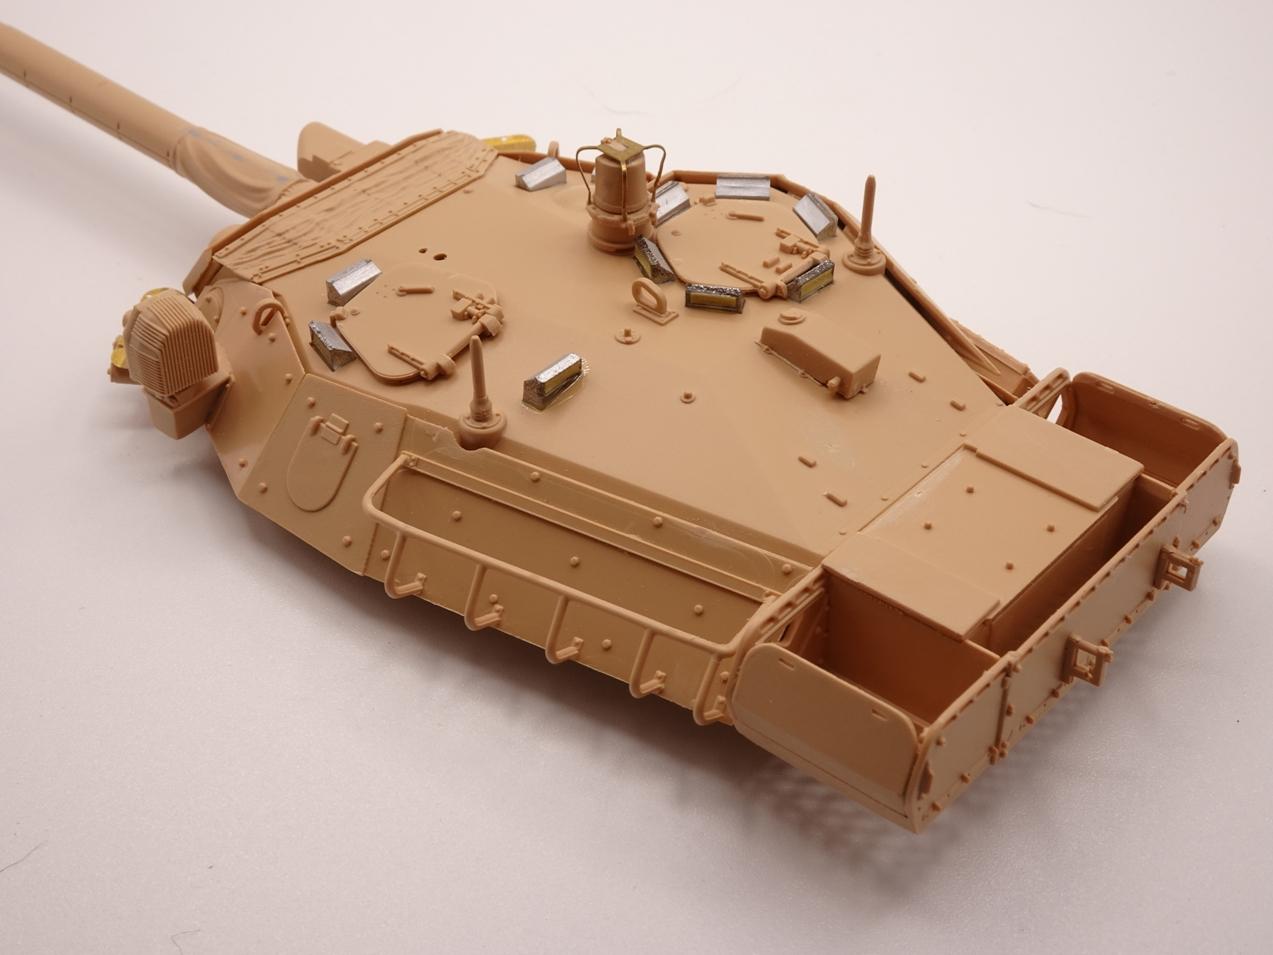 [Tiger Model] AMX-10RCR réf. 4602 - 1/35 - Page 2 Amx10-1907-5